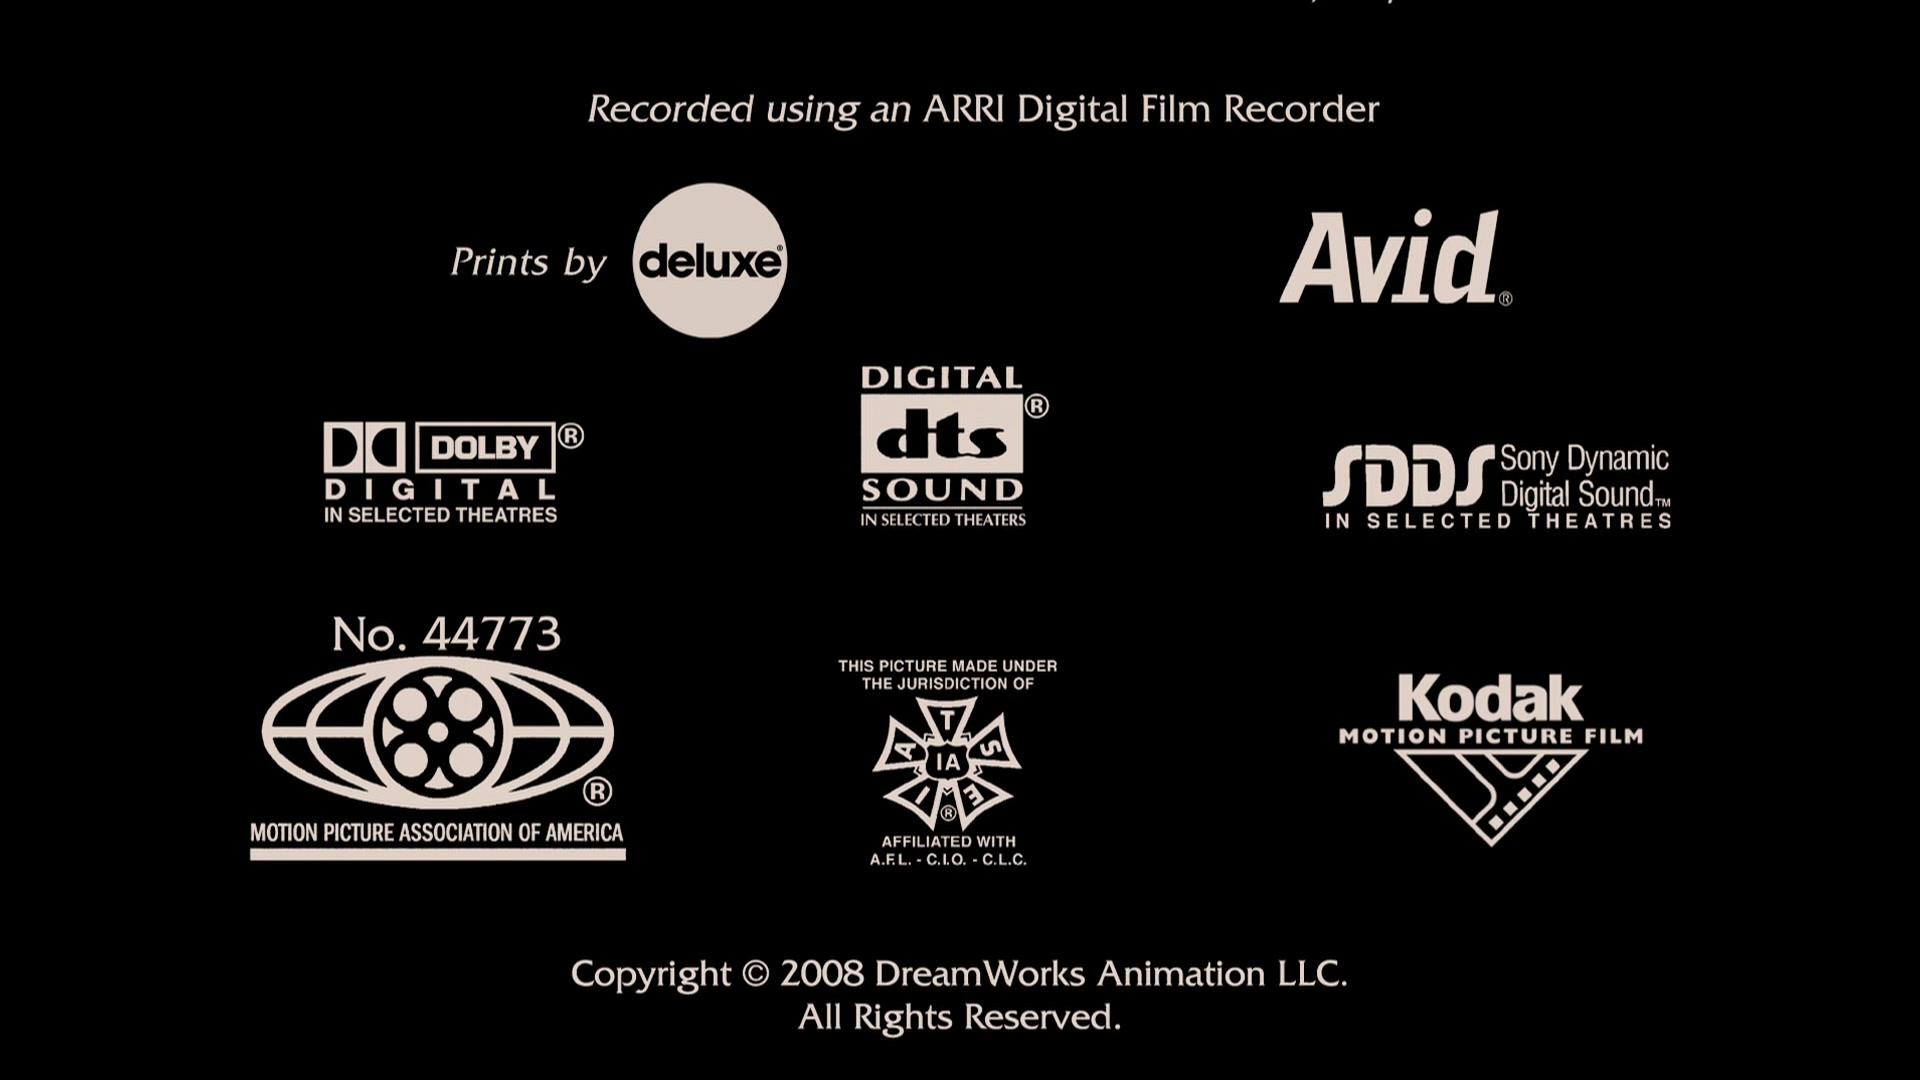 Walt Disney Motion Pictures Group